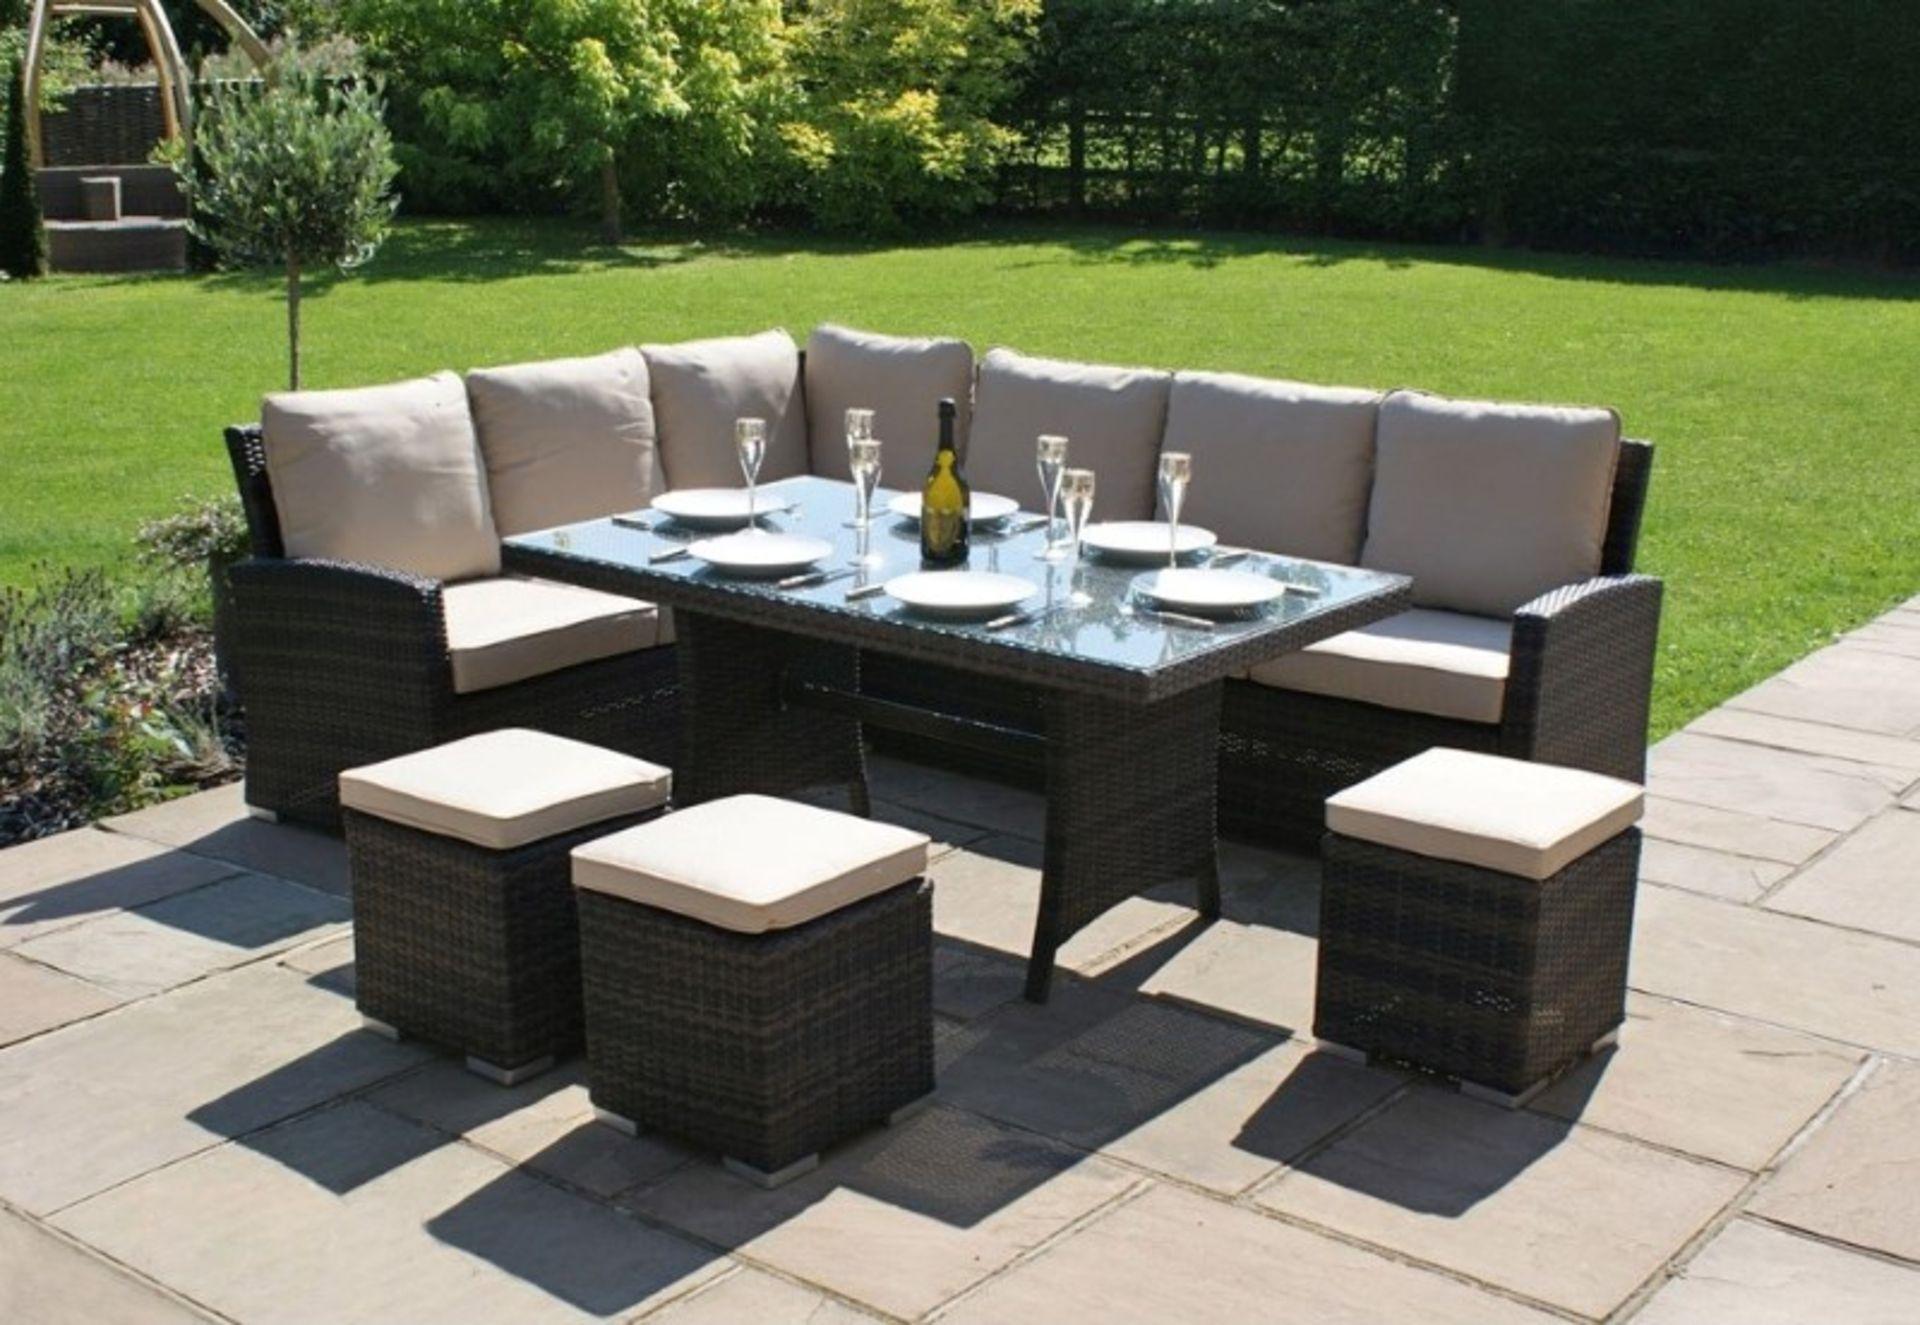 Lot 15012 - + VAT Brand New Chelsea Garden Company 8-Seater Light Brown Rattan Luxury Corner Outdoor Dining Set